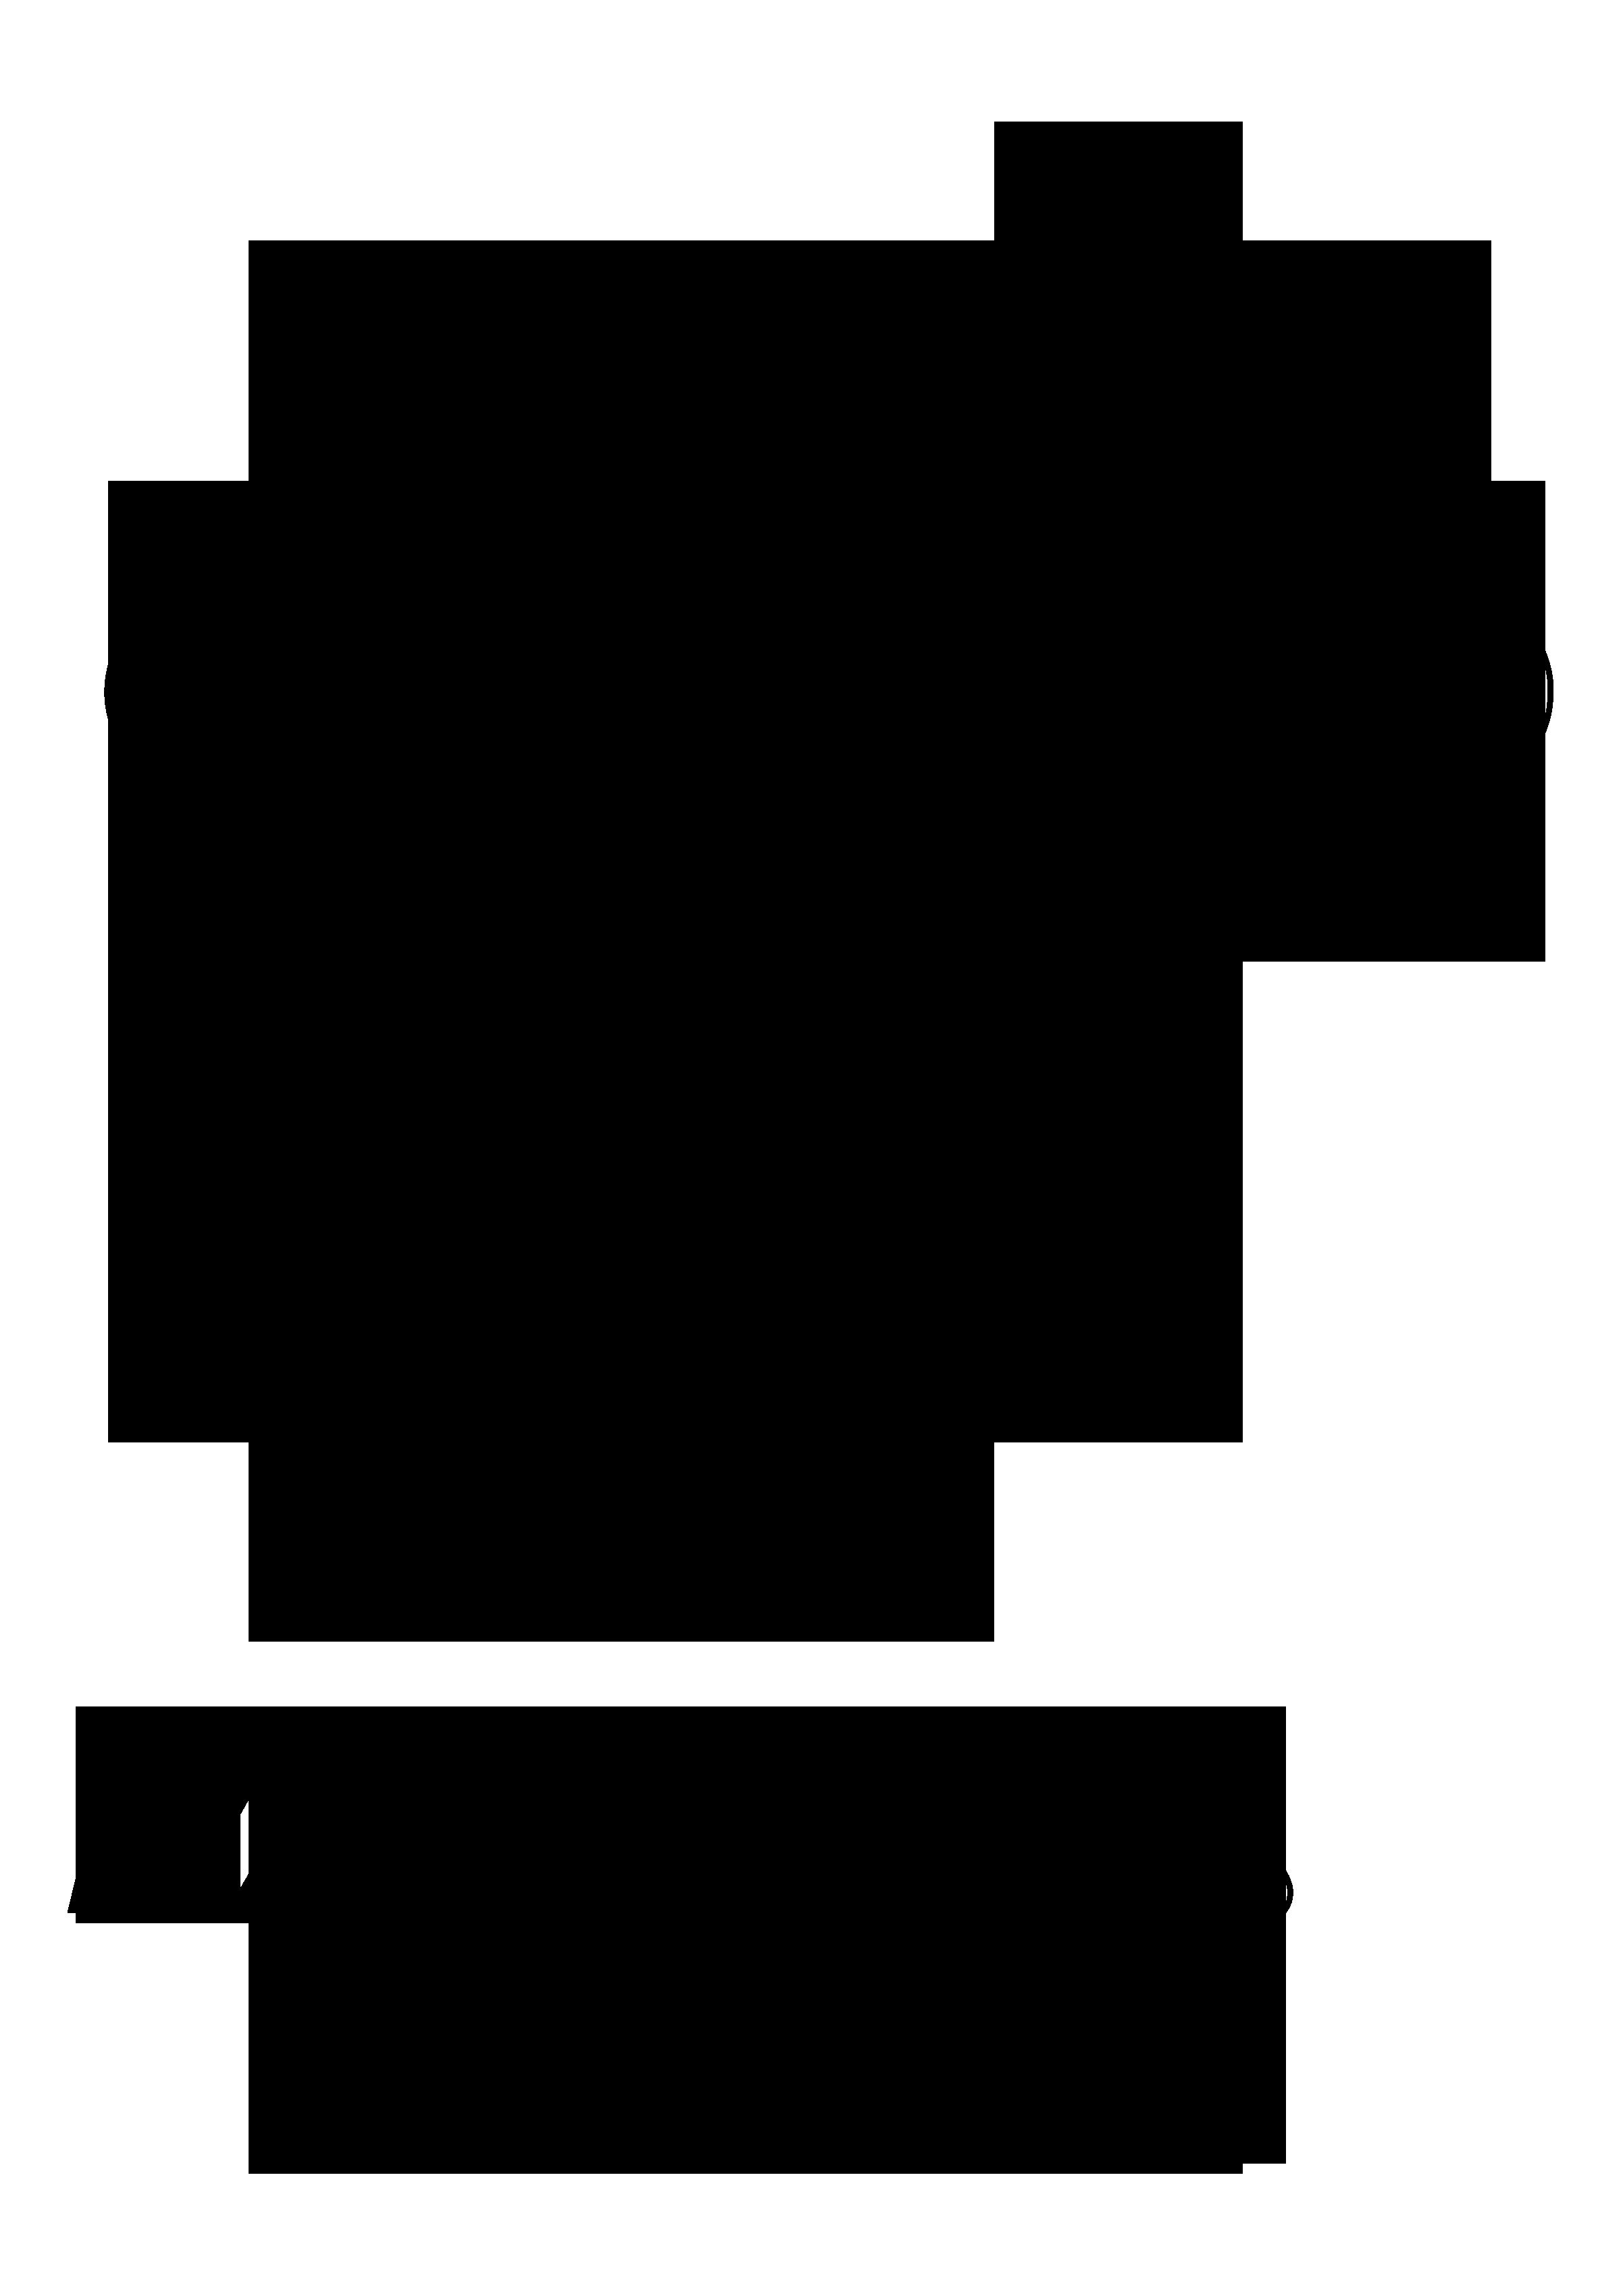 2400x3400 Miami Heat Logo Png Transparent Amp Svg Vector